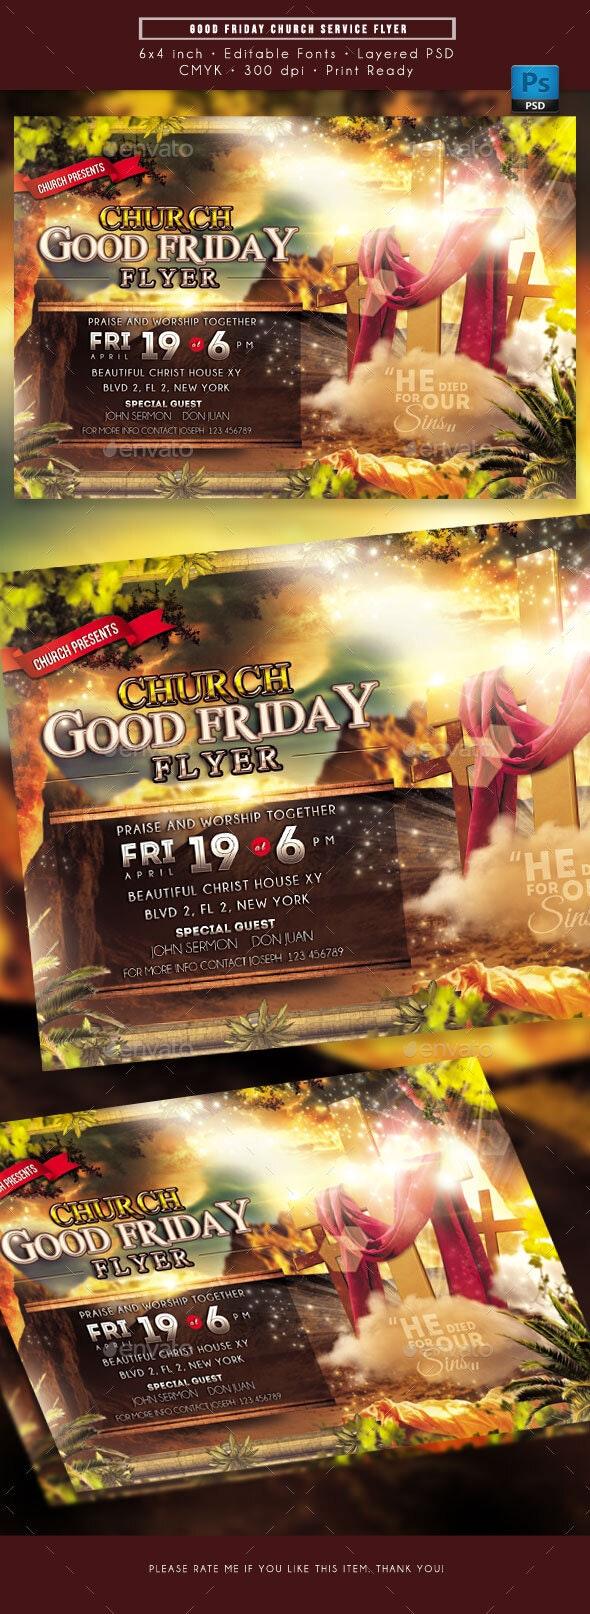 Good Friday Church Service Flyer - Church Flyers